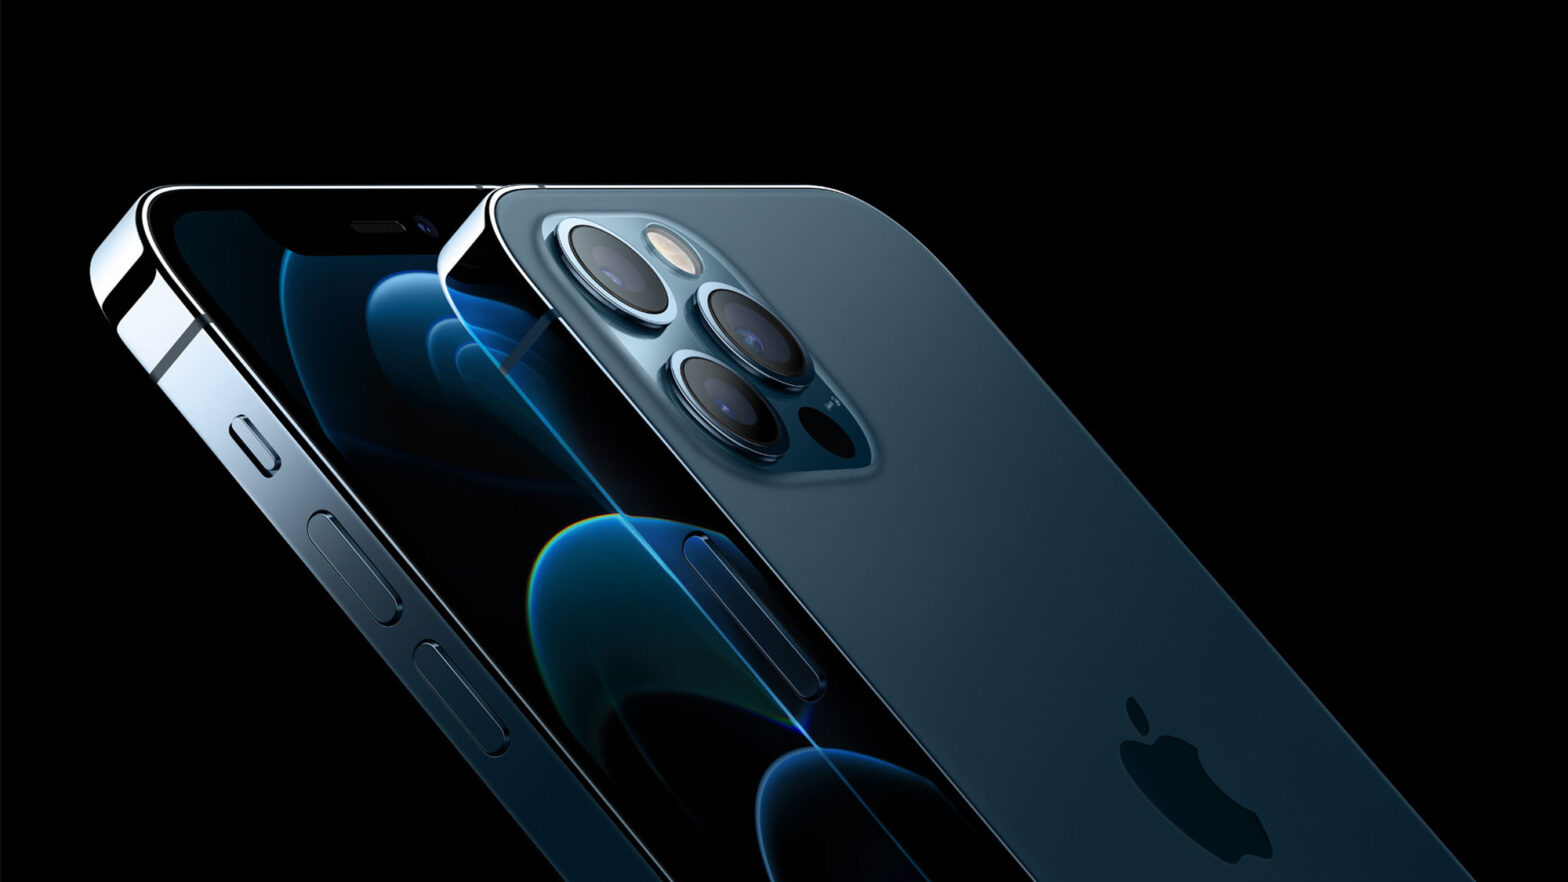 Apple iPhone 12 Pro Smartphone